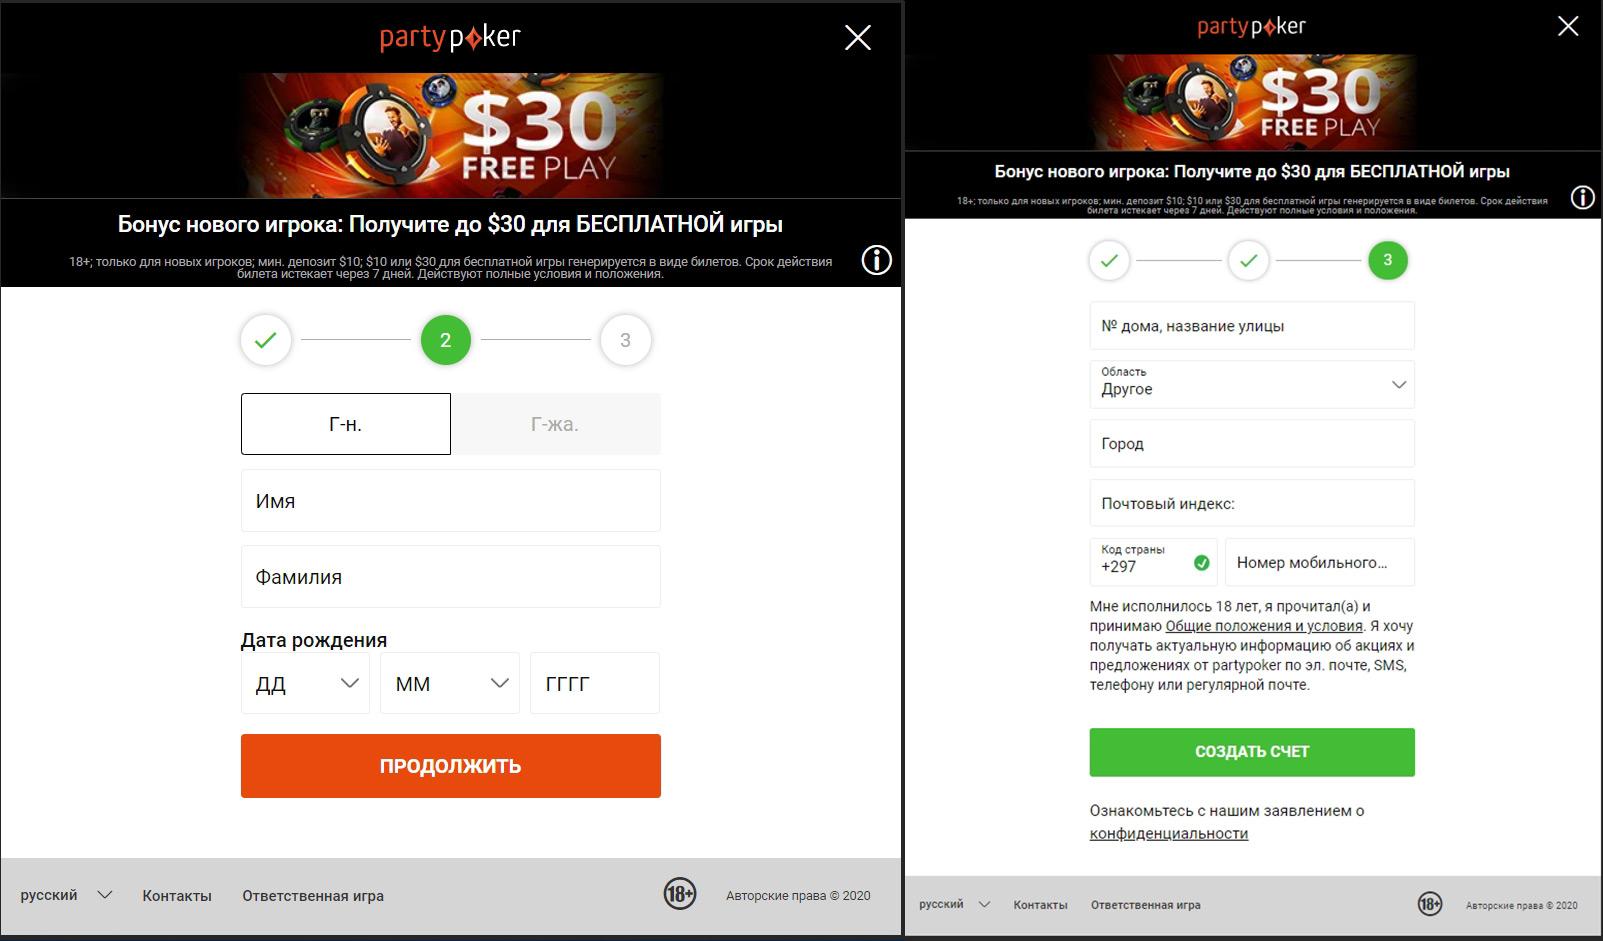 Регистрация на partypoker - 2 и 3 шаг.